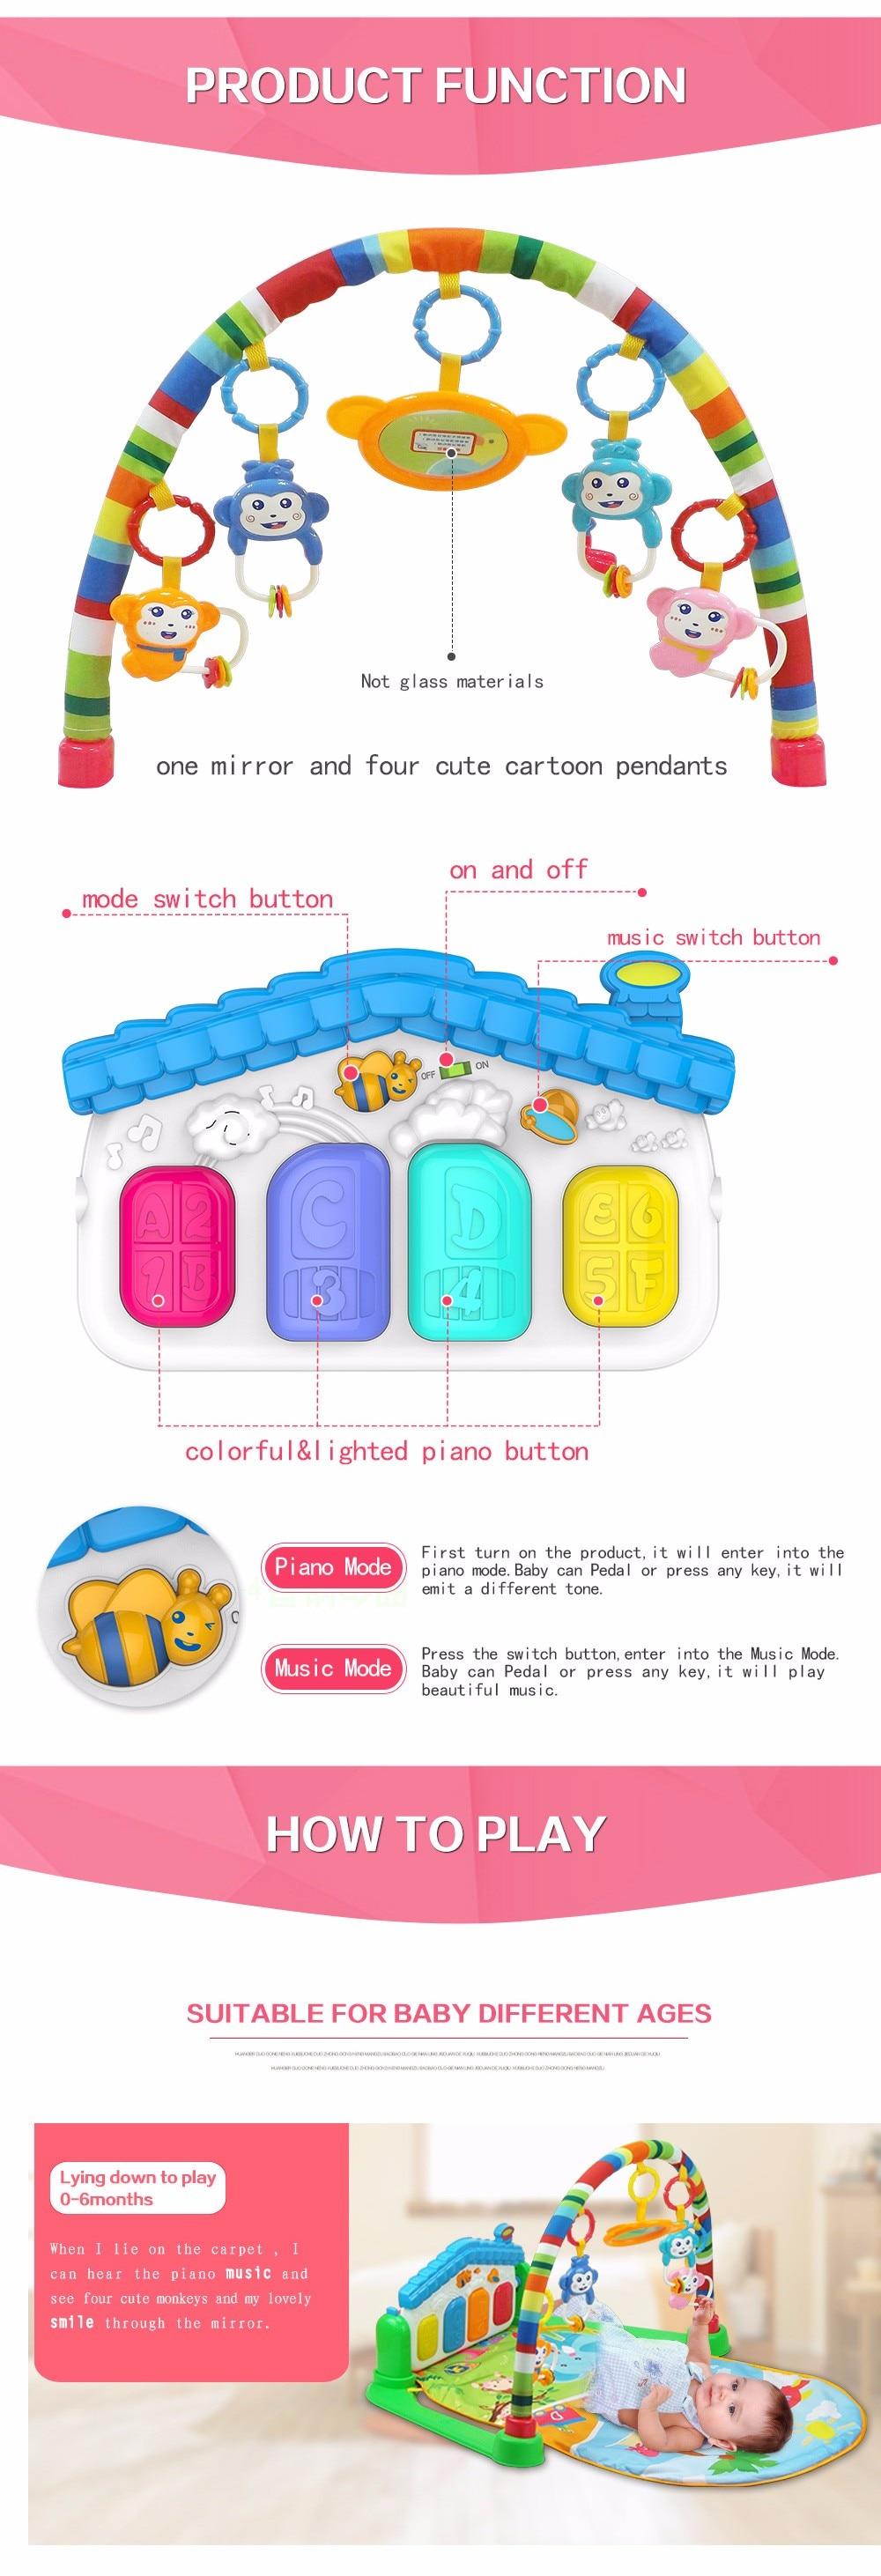 Baby 3 in 1 Piano Safari Playmat Multifunction Animals Fitness GymArch Xmas Gift